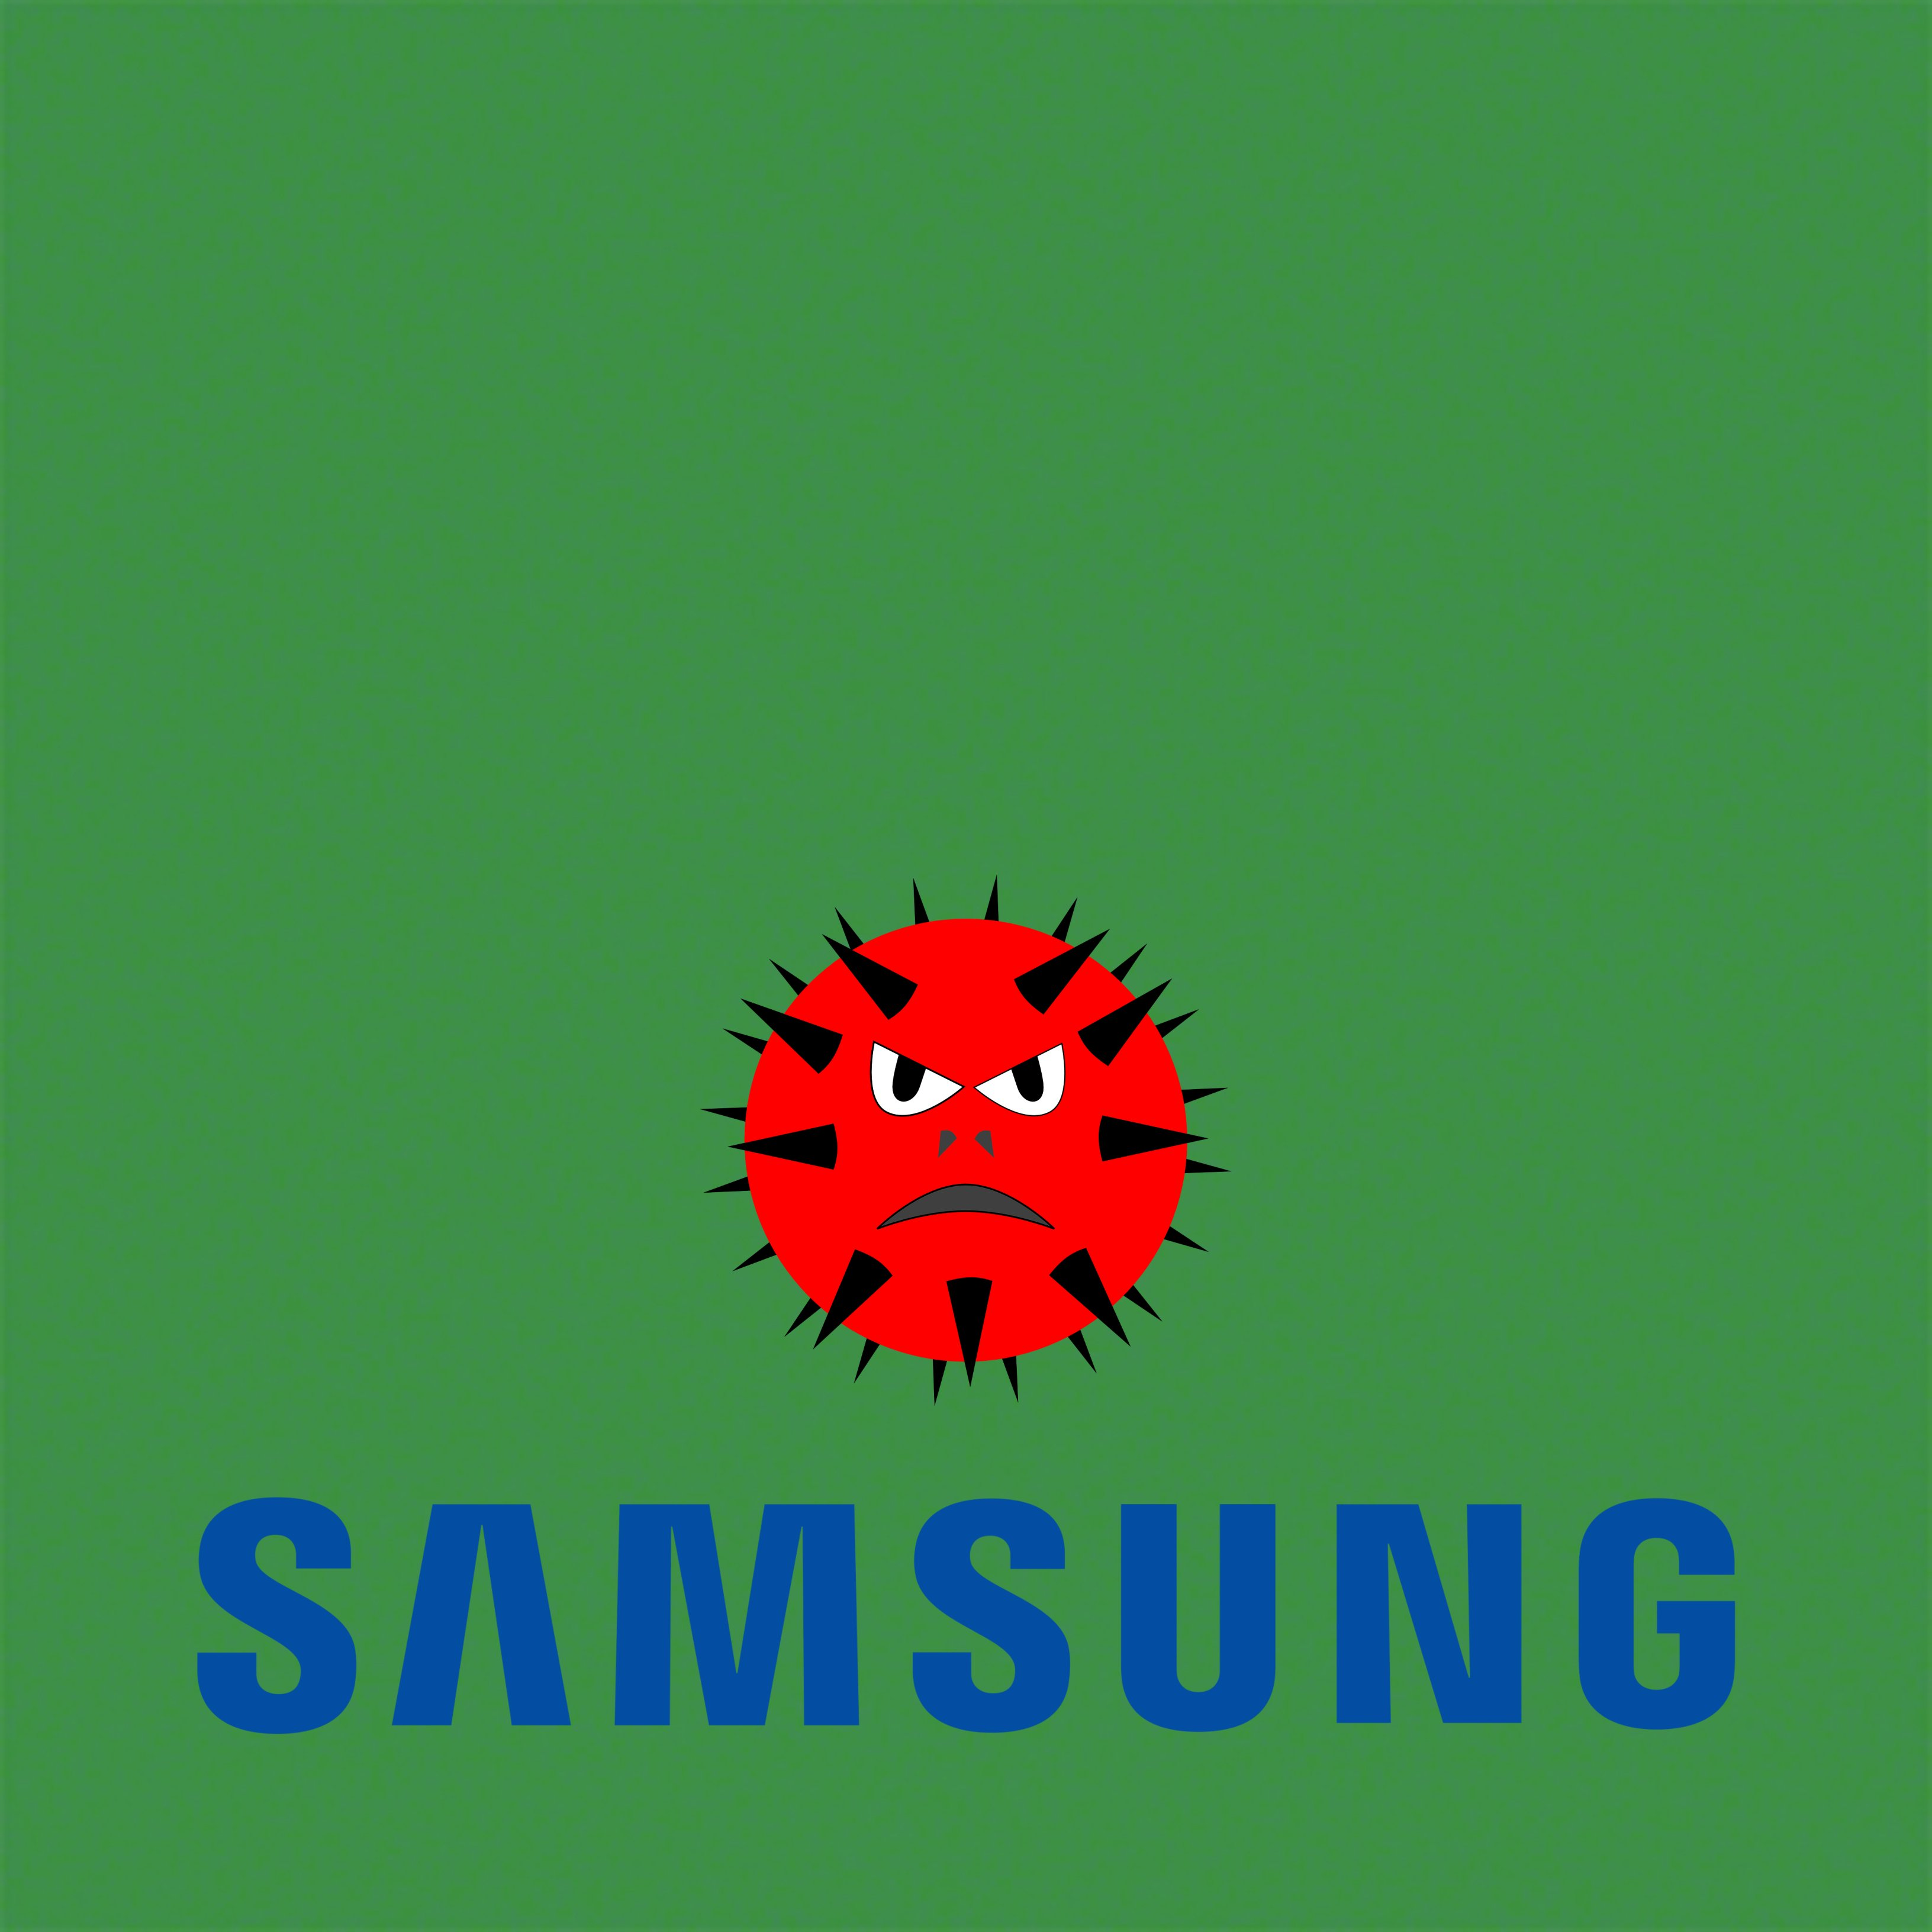 Samsung virus